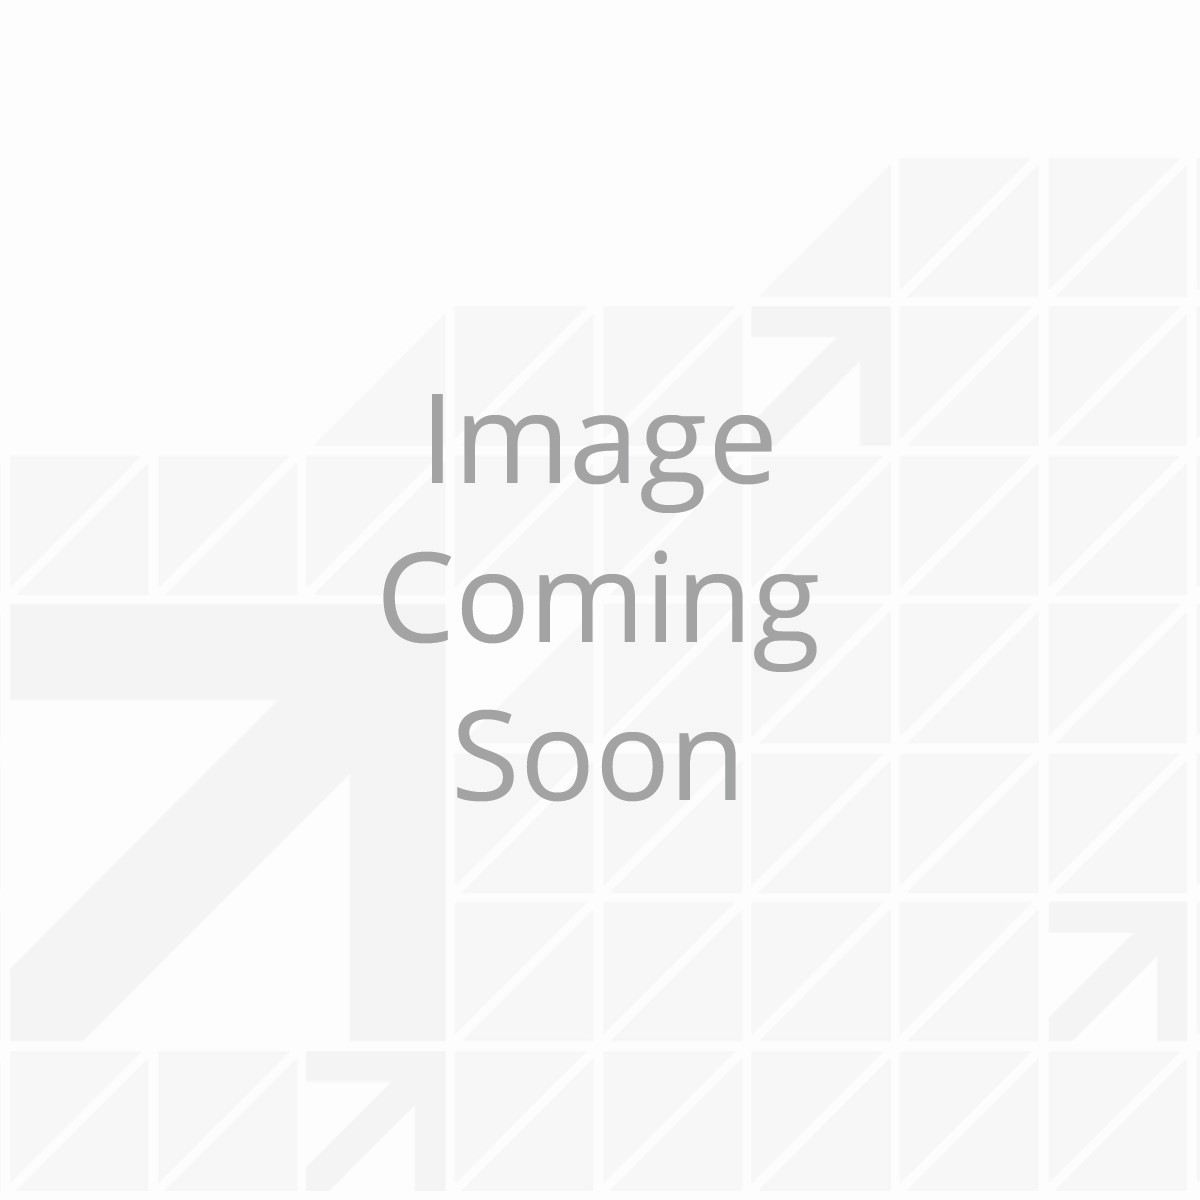 4 Room Manifold & Valves (w/o Plate)